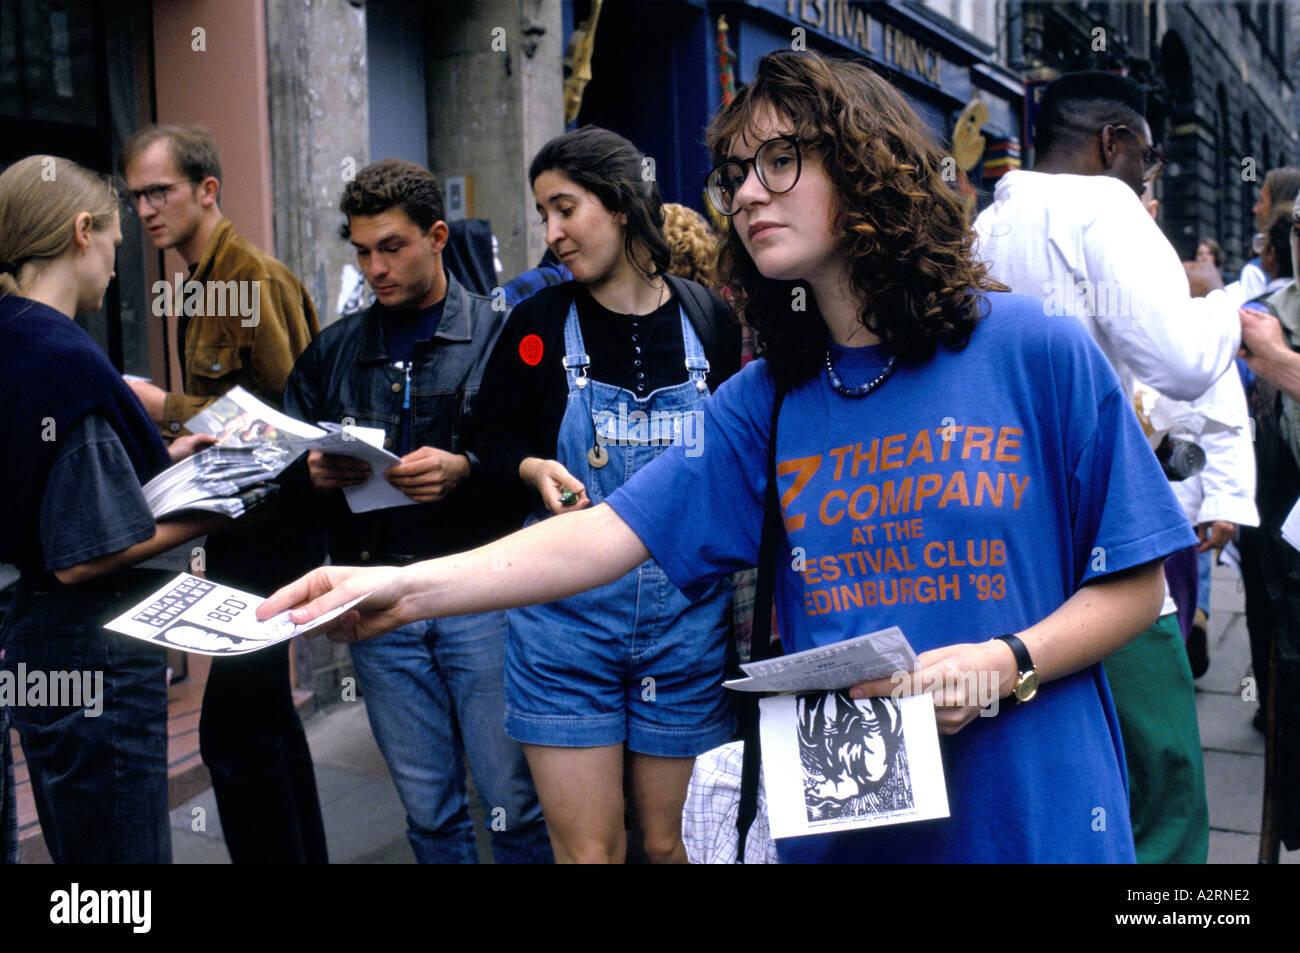 theatre company staff handing out flyers on the street edinburgh Stock Photo: 3455457 - Alamy